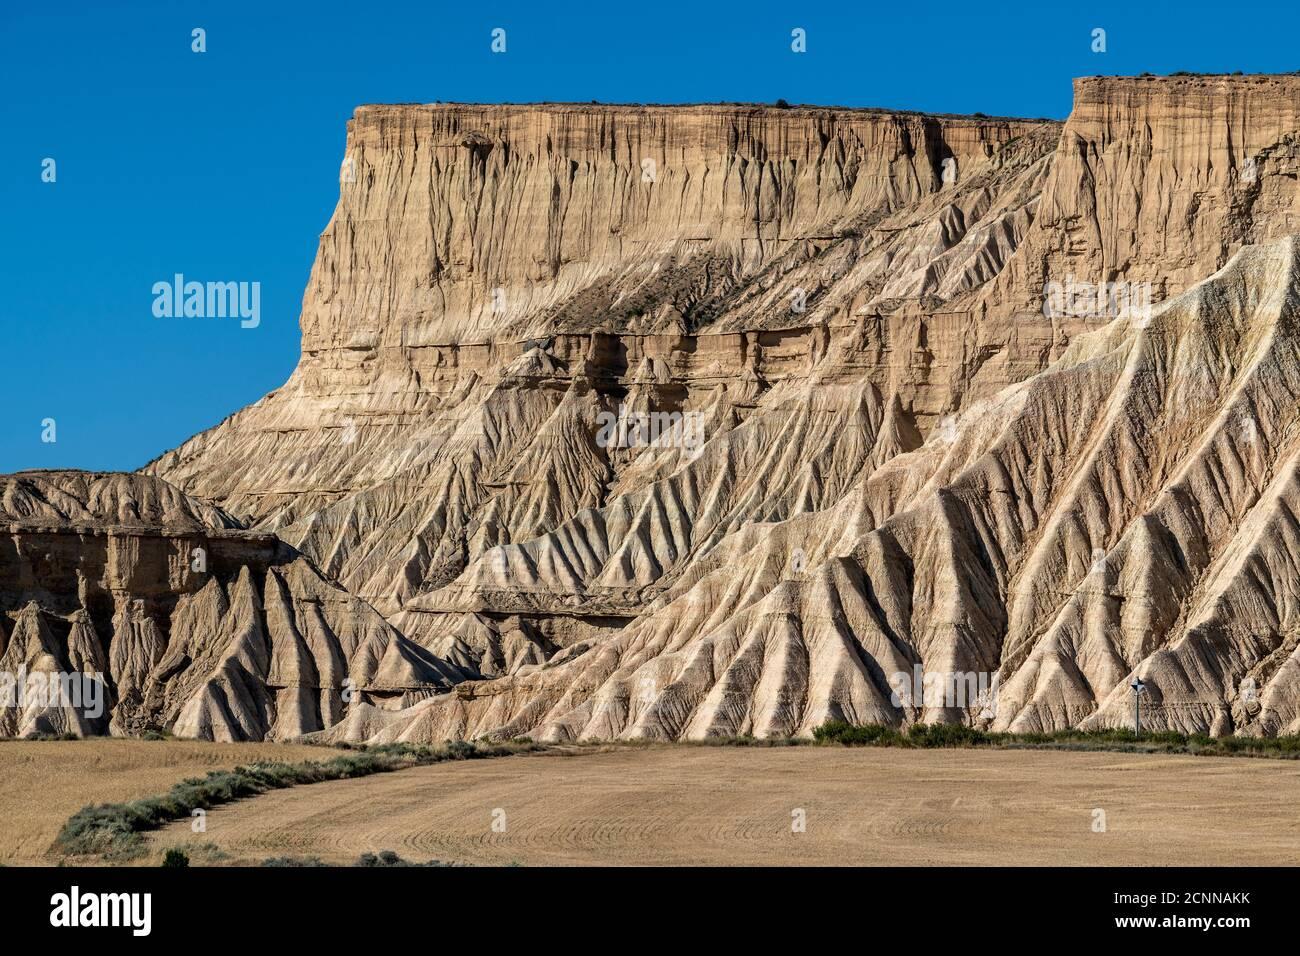 Formations rocheuses, Badlands de Bardenas Reales, Navarre, Espagne Banque D'Images